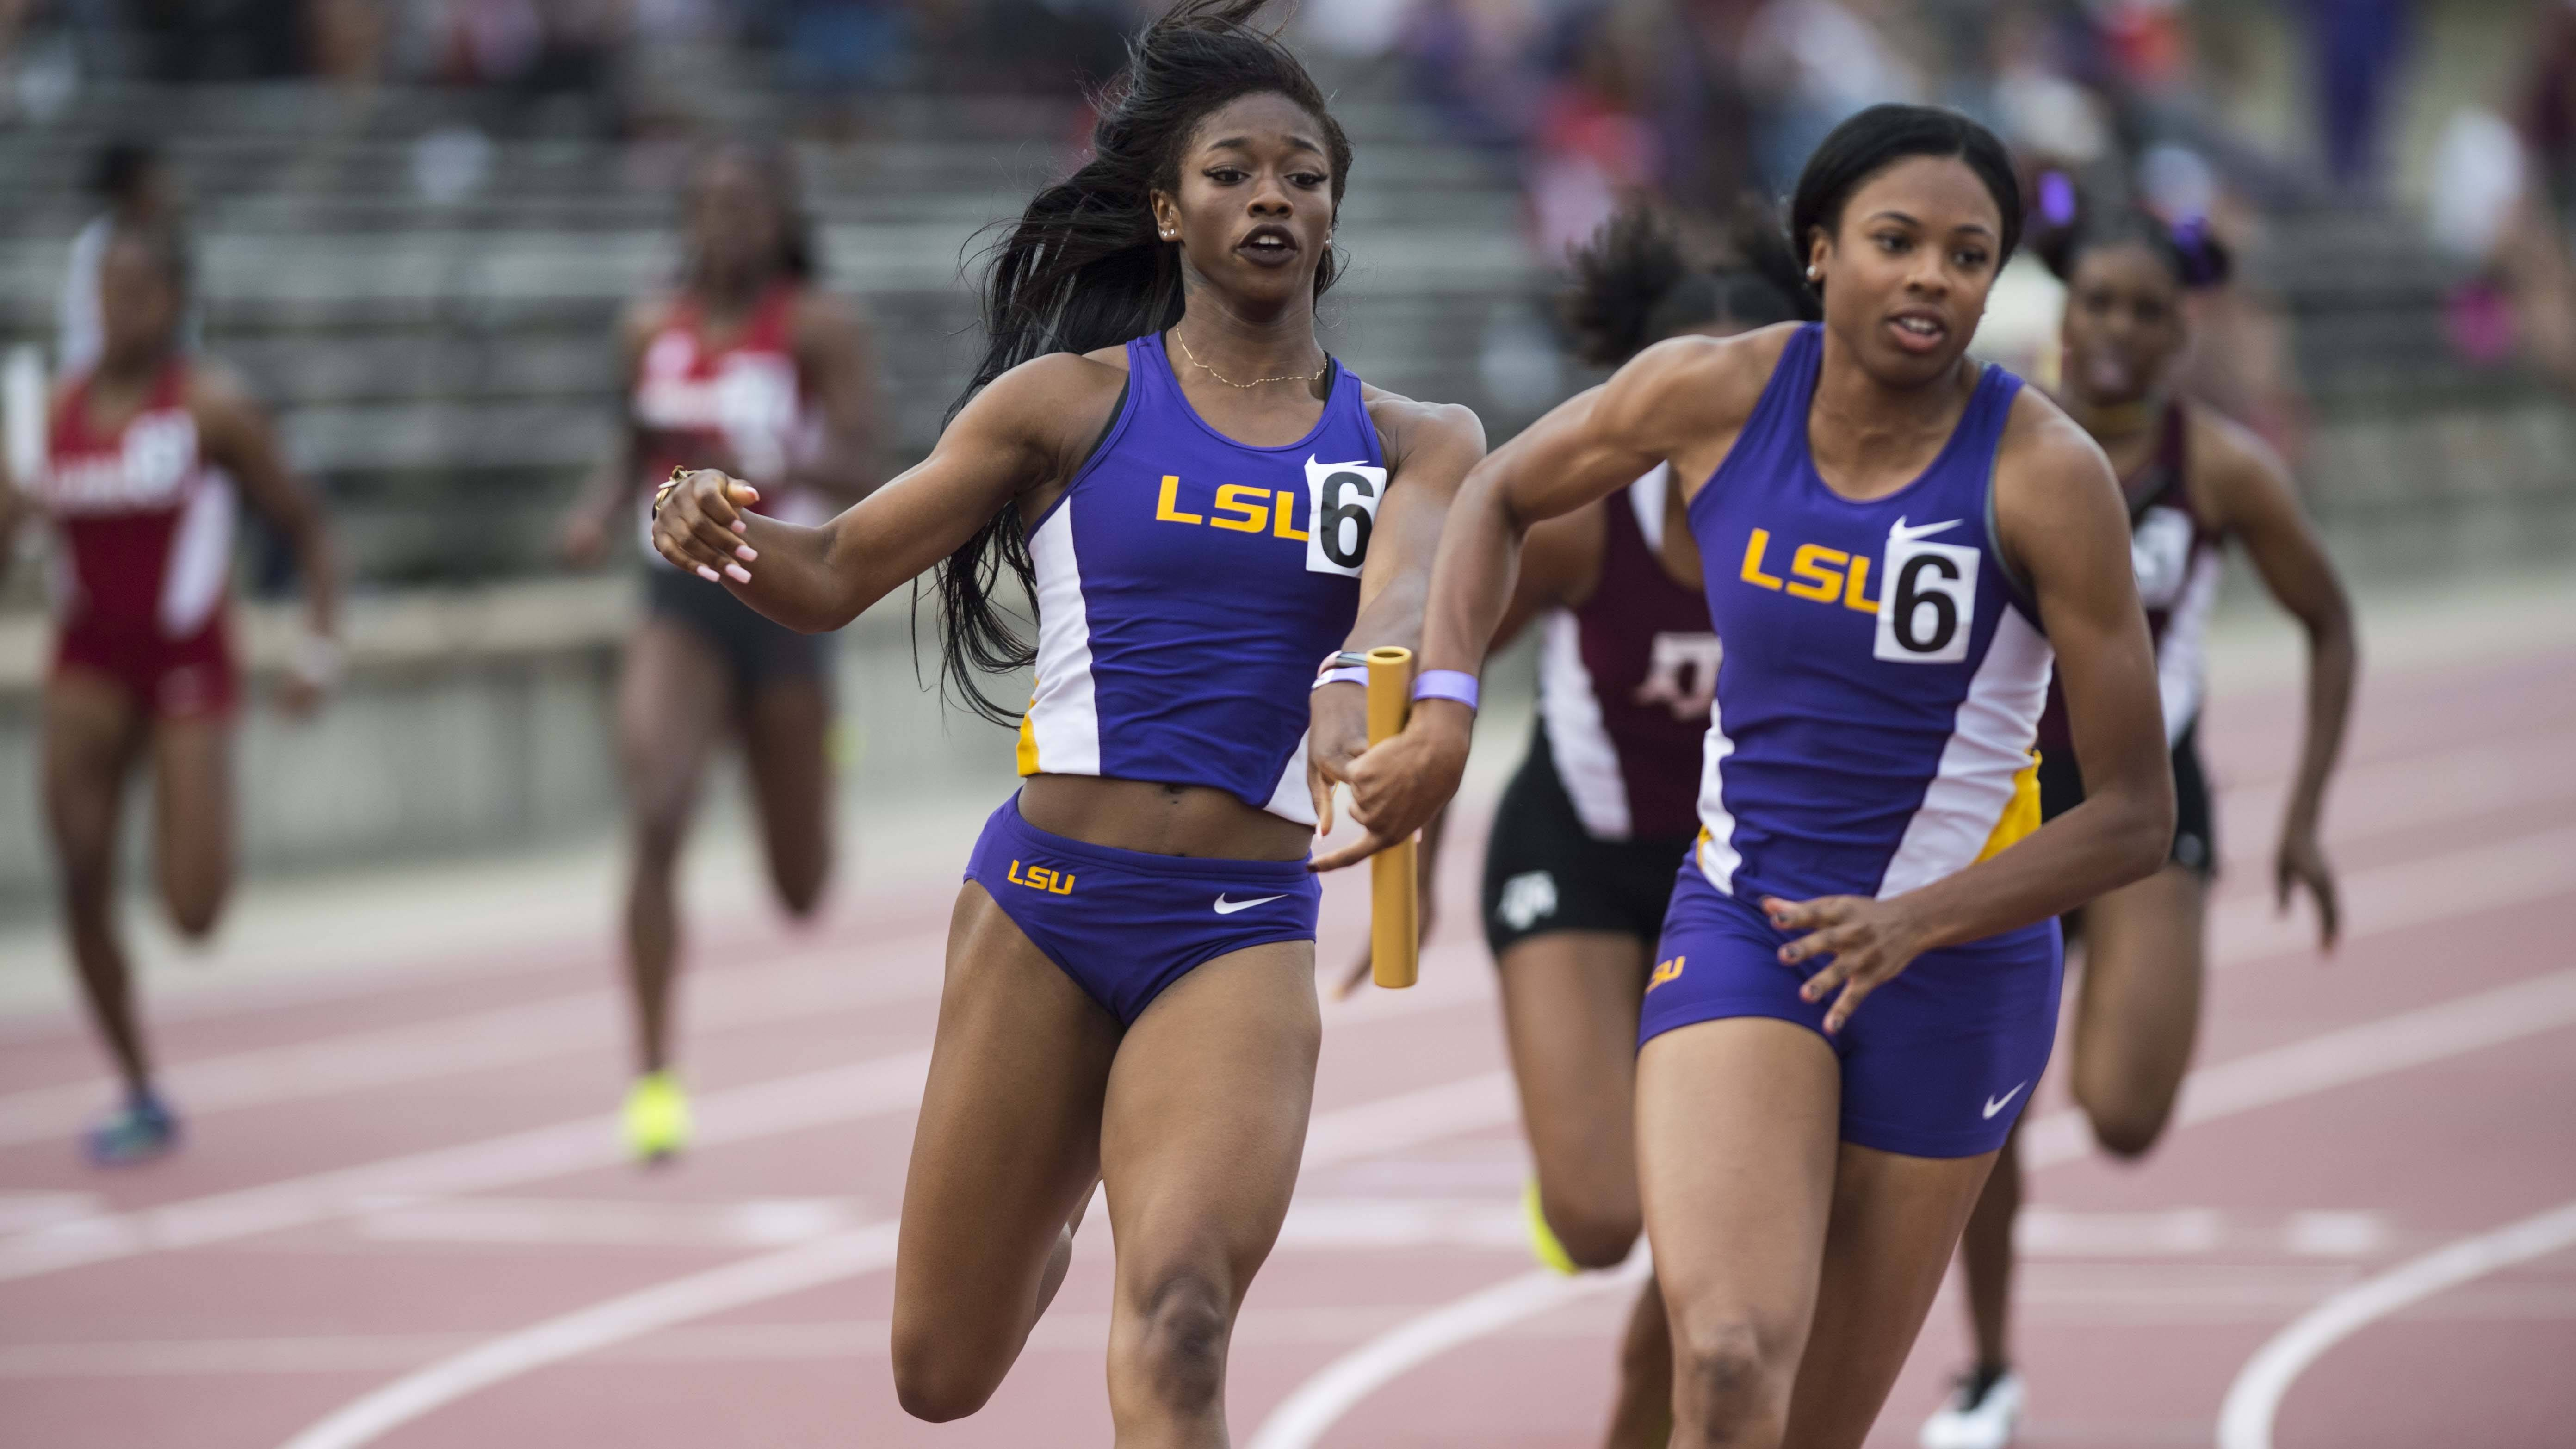 LSU Track and Field